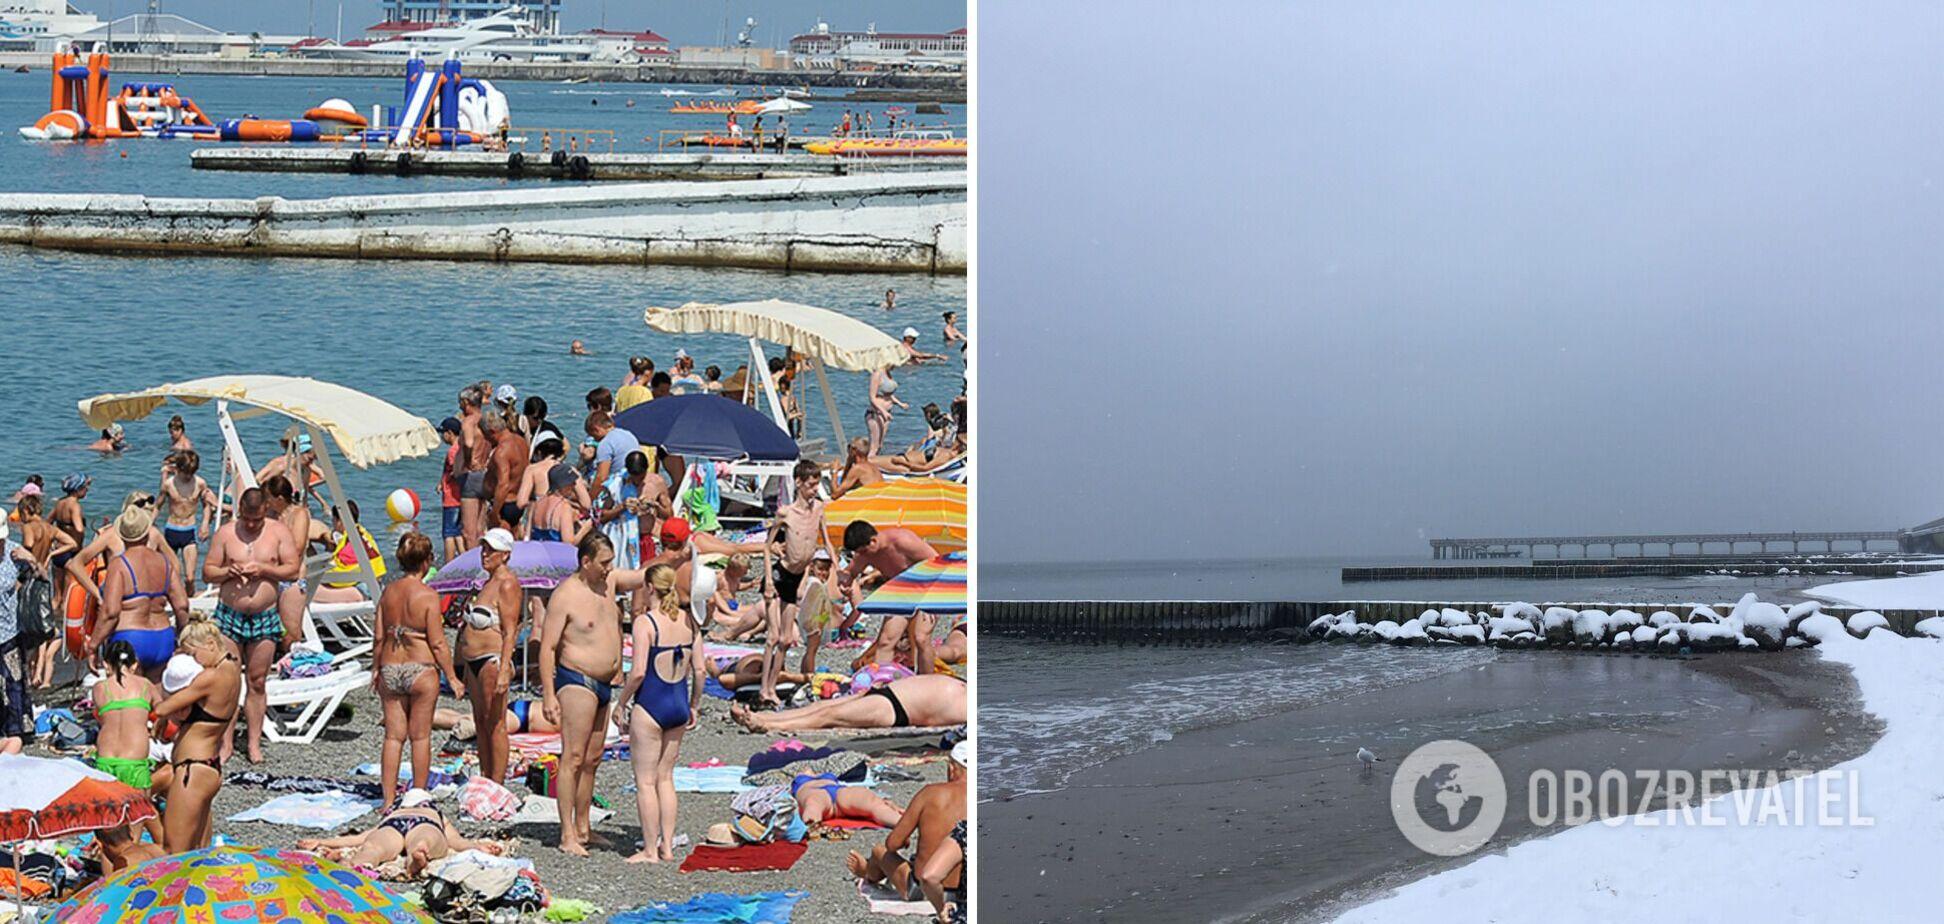 Летом на море слишком много туристов, а зимой пусто